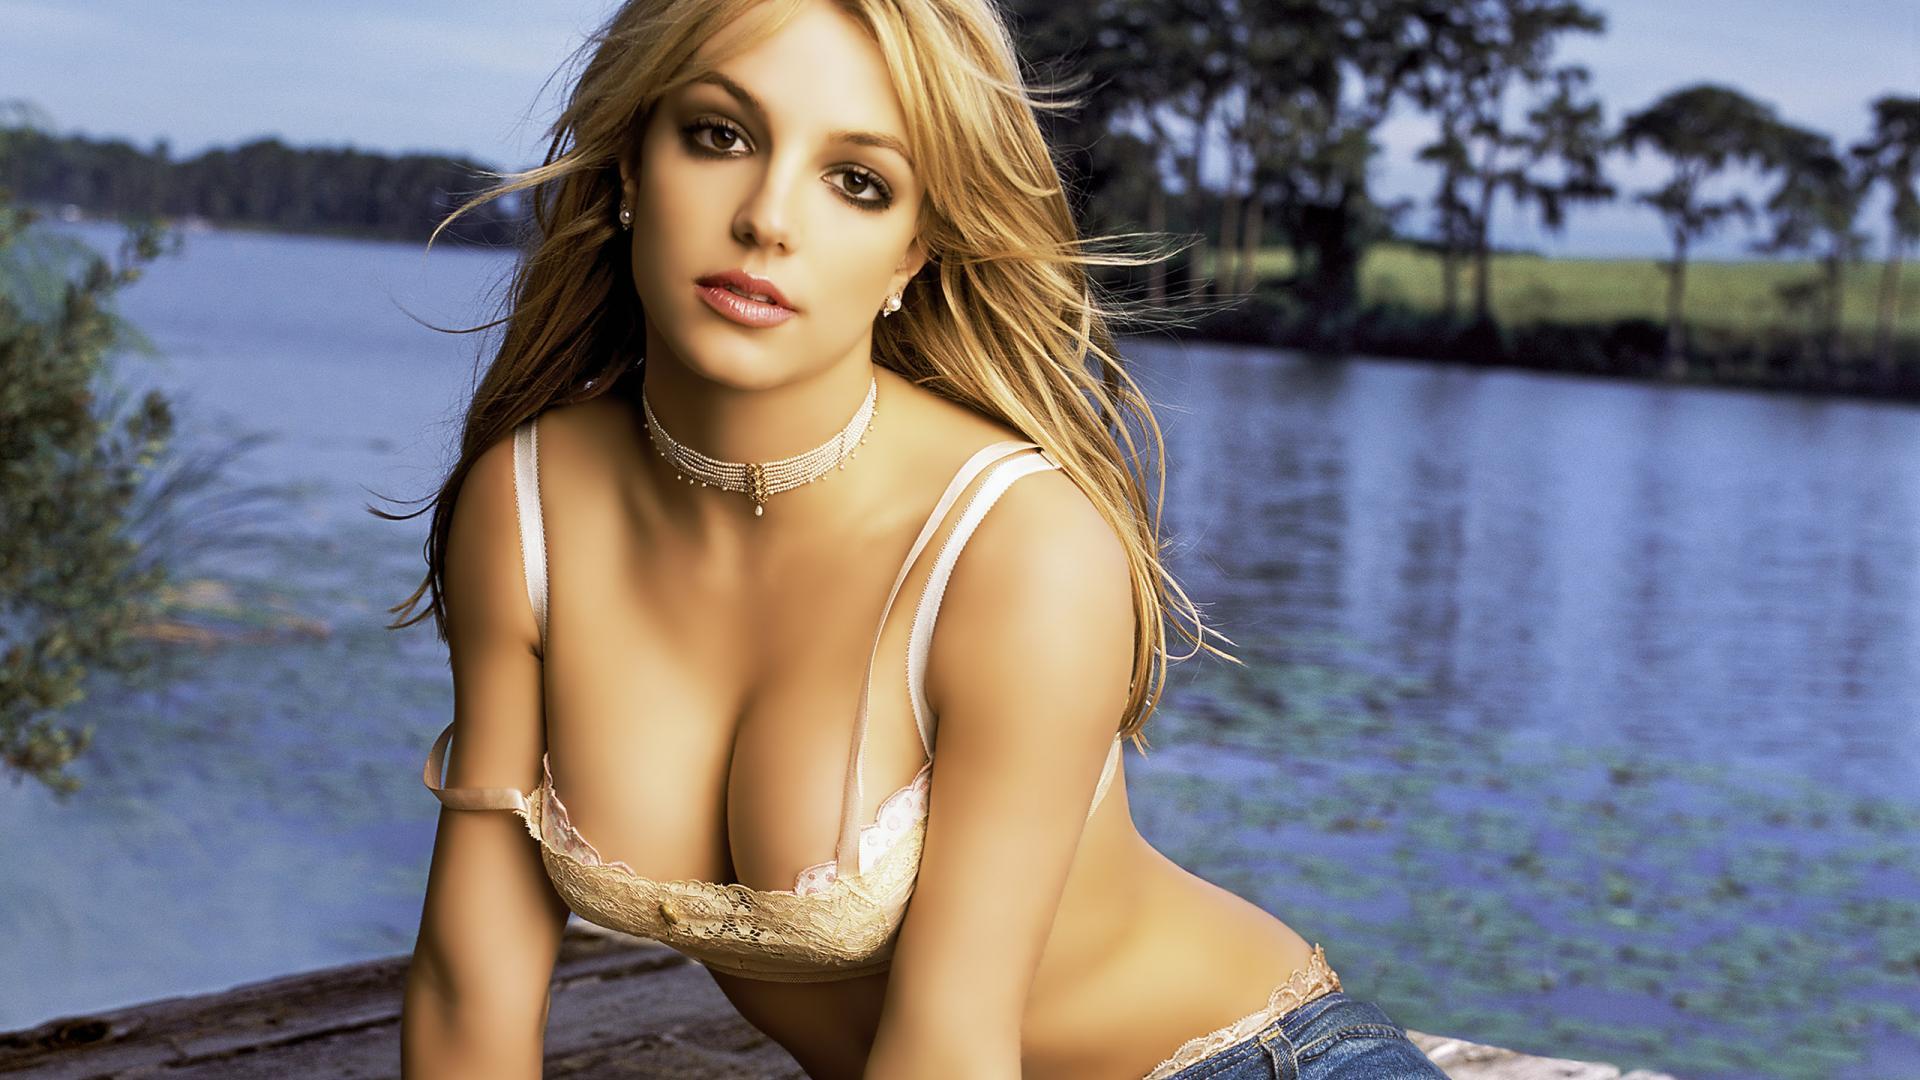 Britney Spears feat. Iggy Azalea – Pretty Girls (Video)